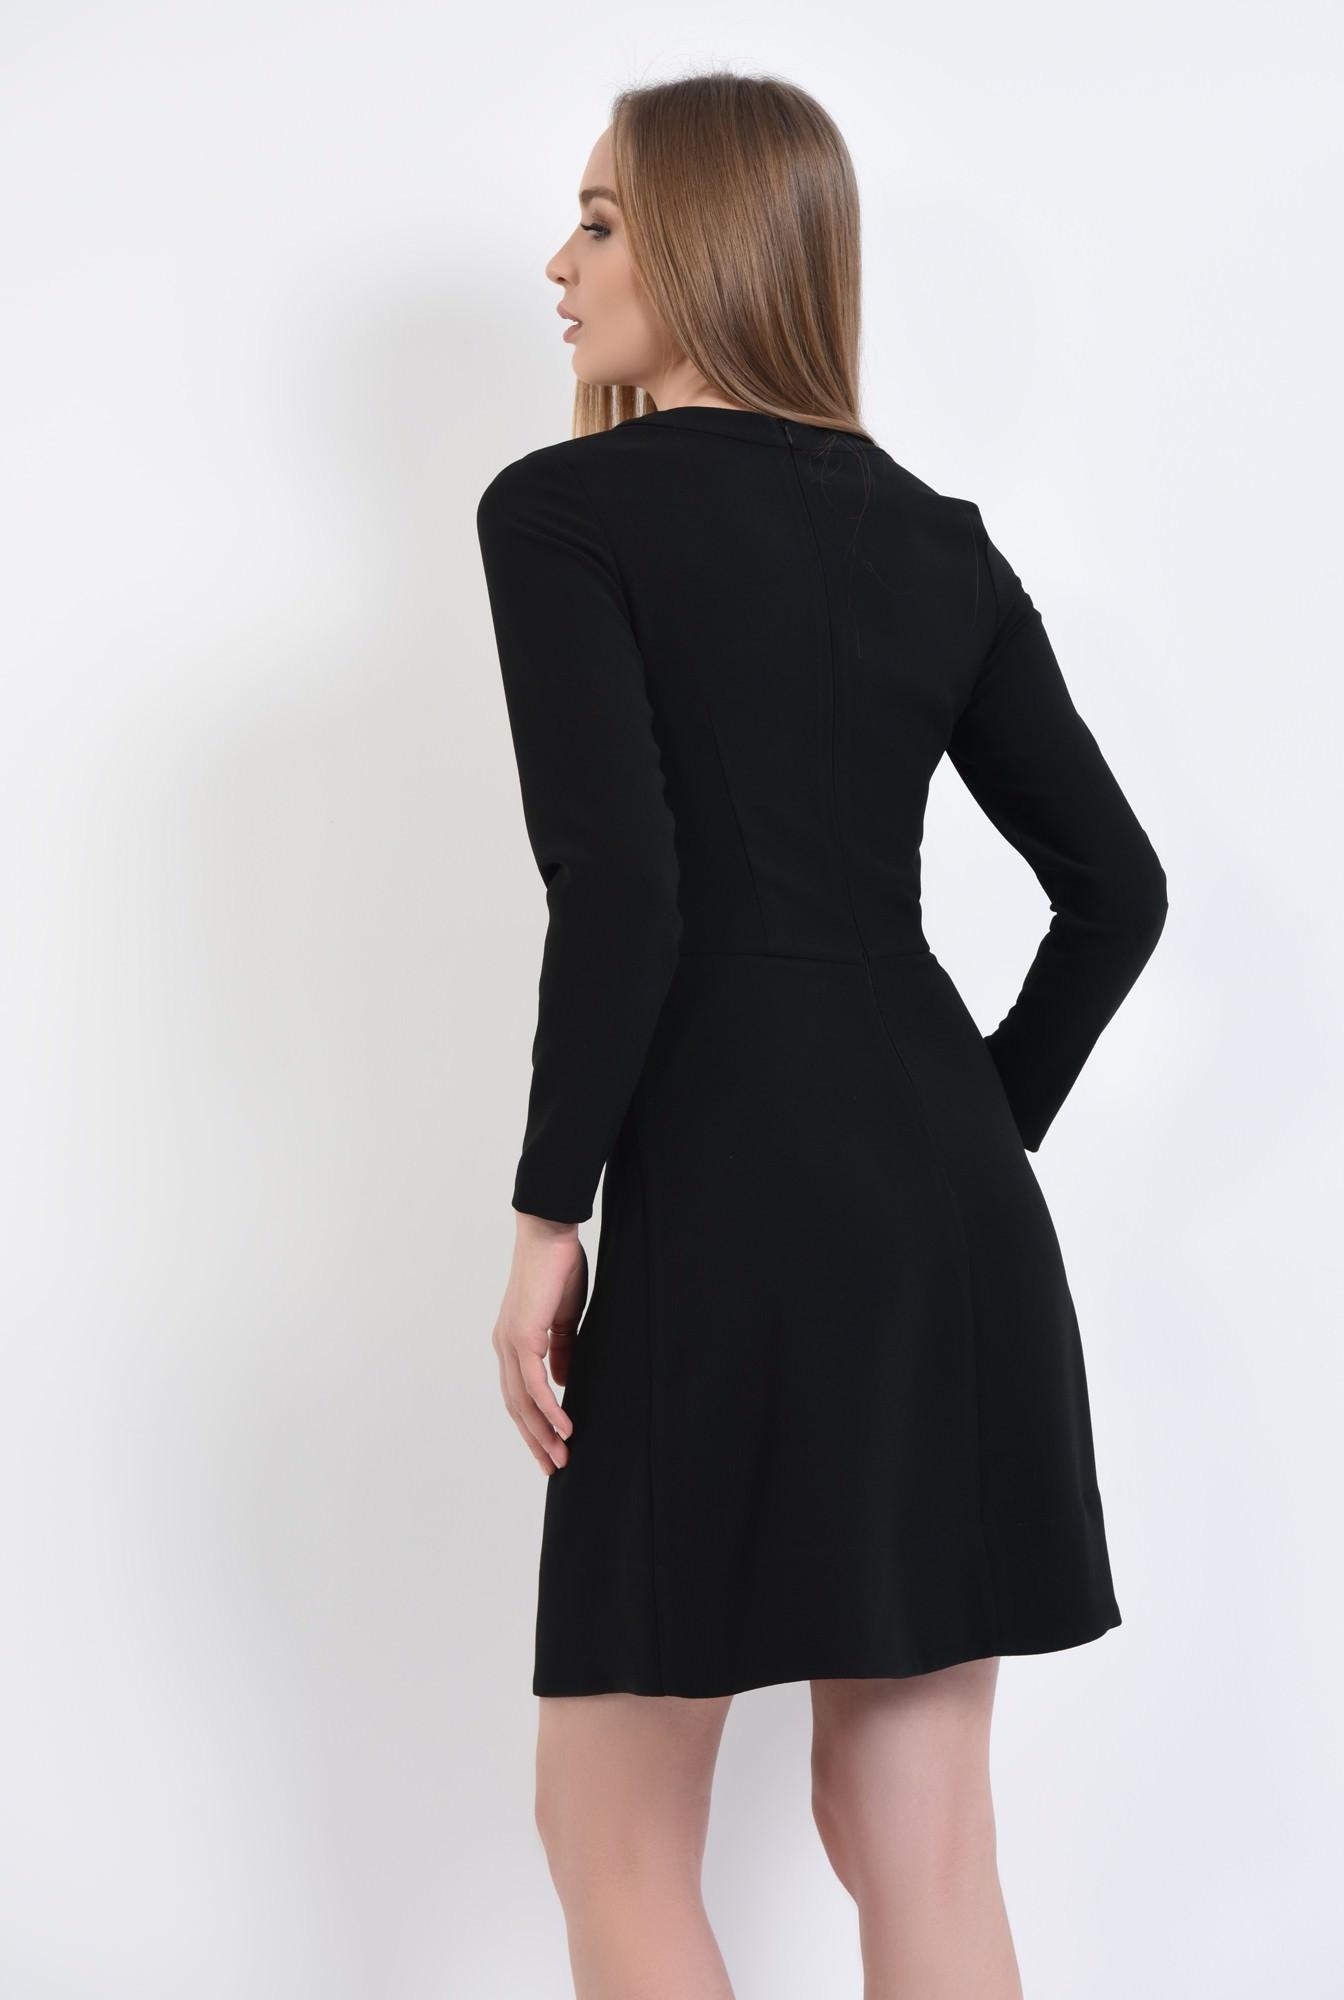 1 - rochie mini, croi A-line, talie cambrata, rochii online